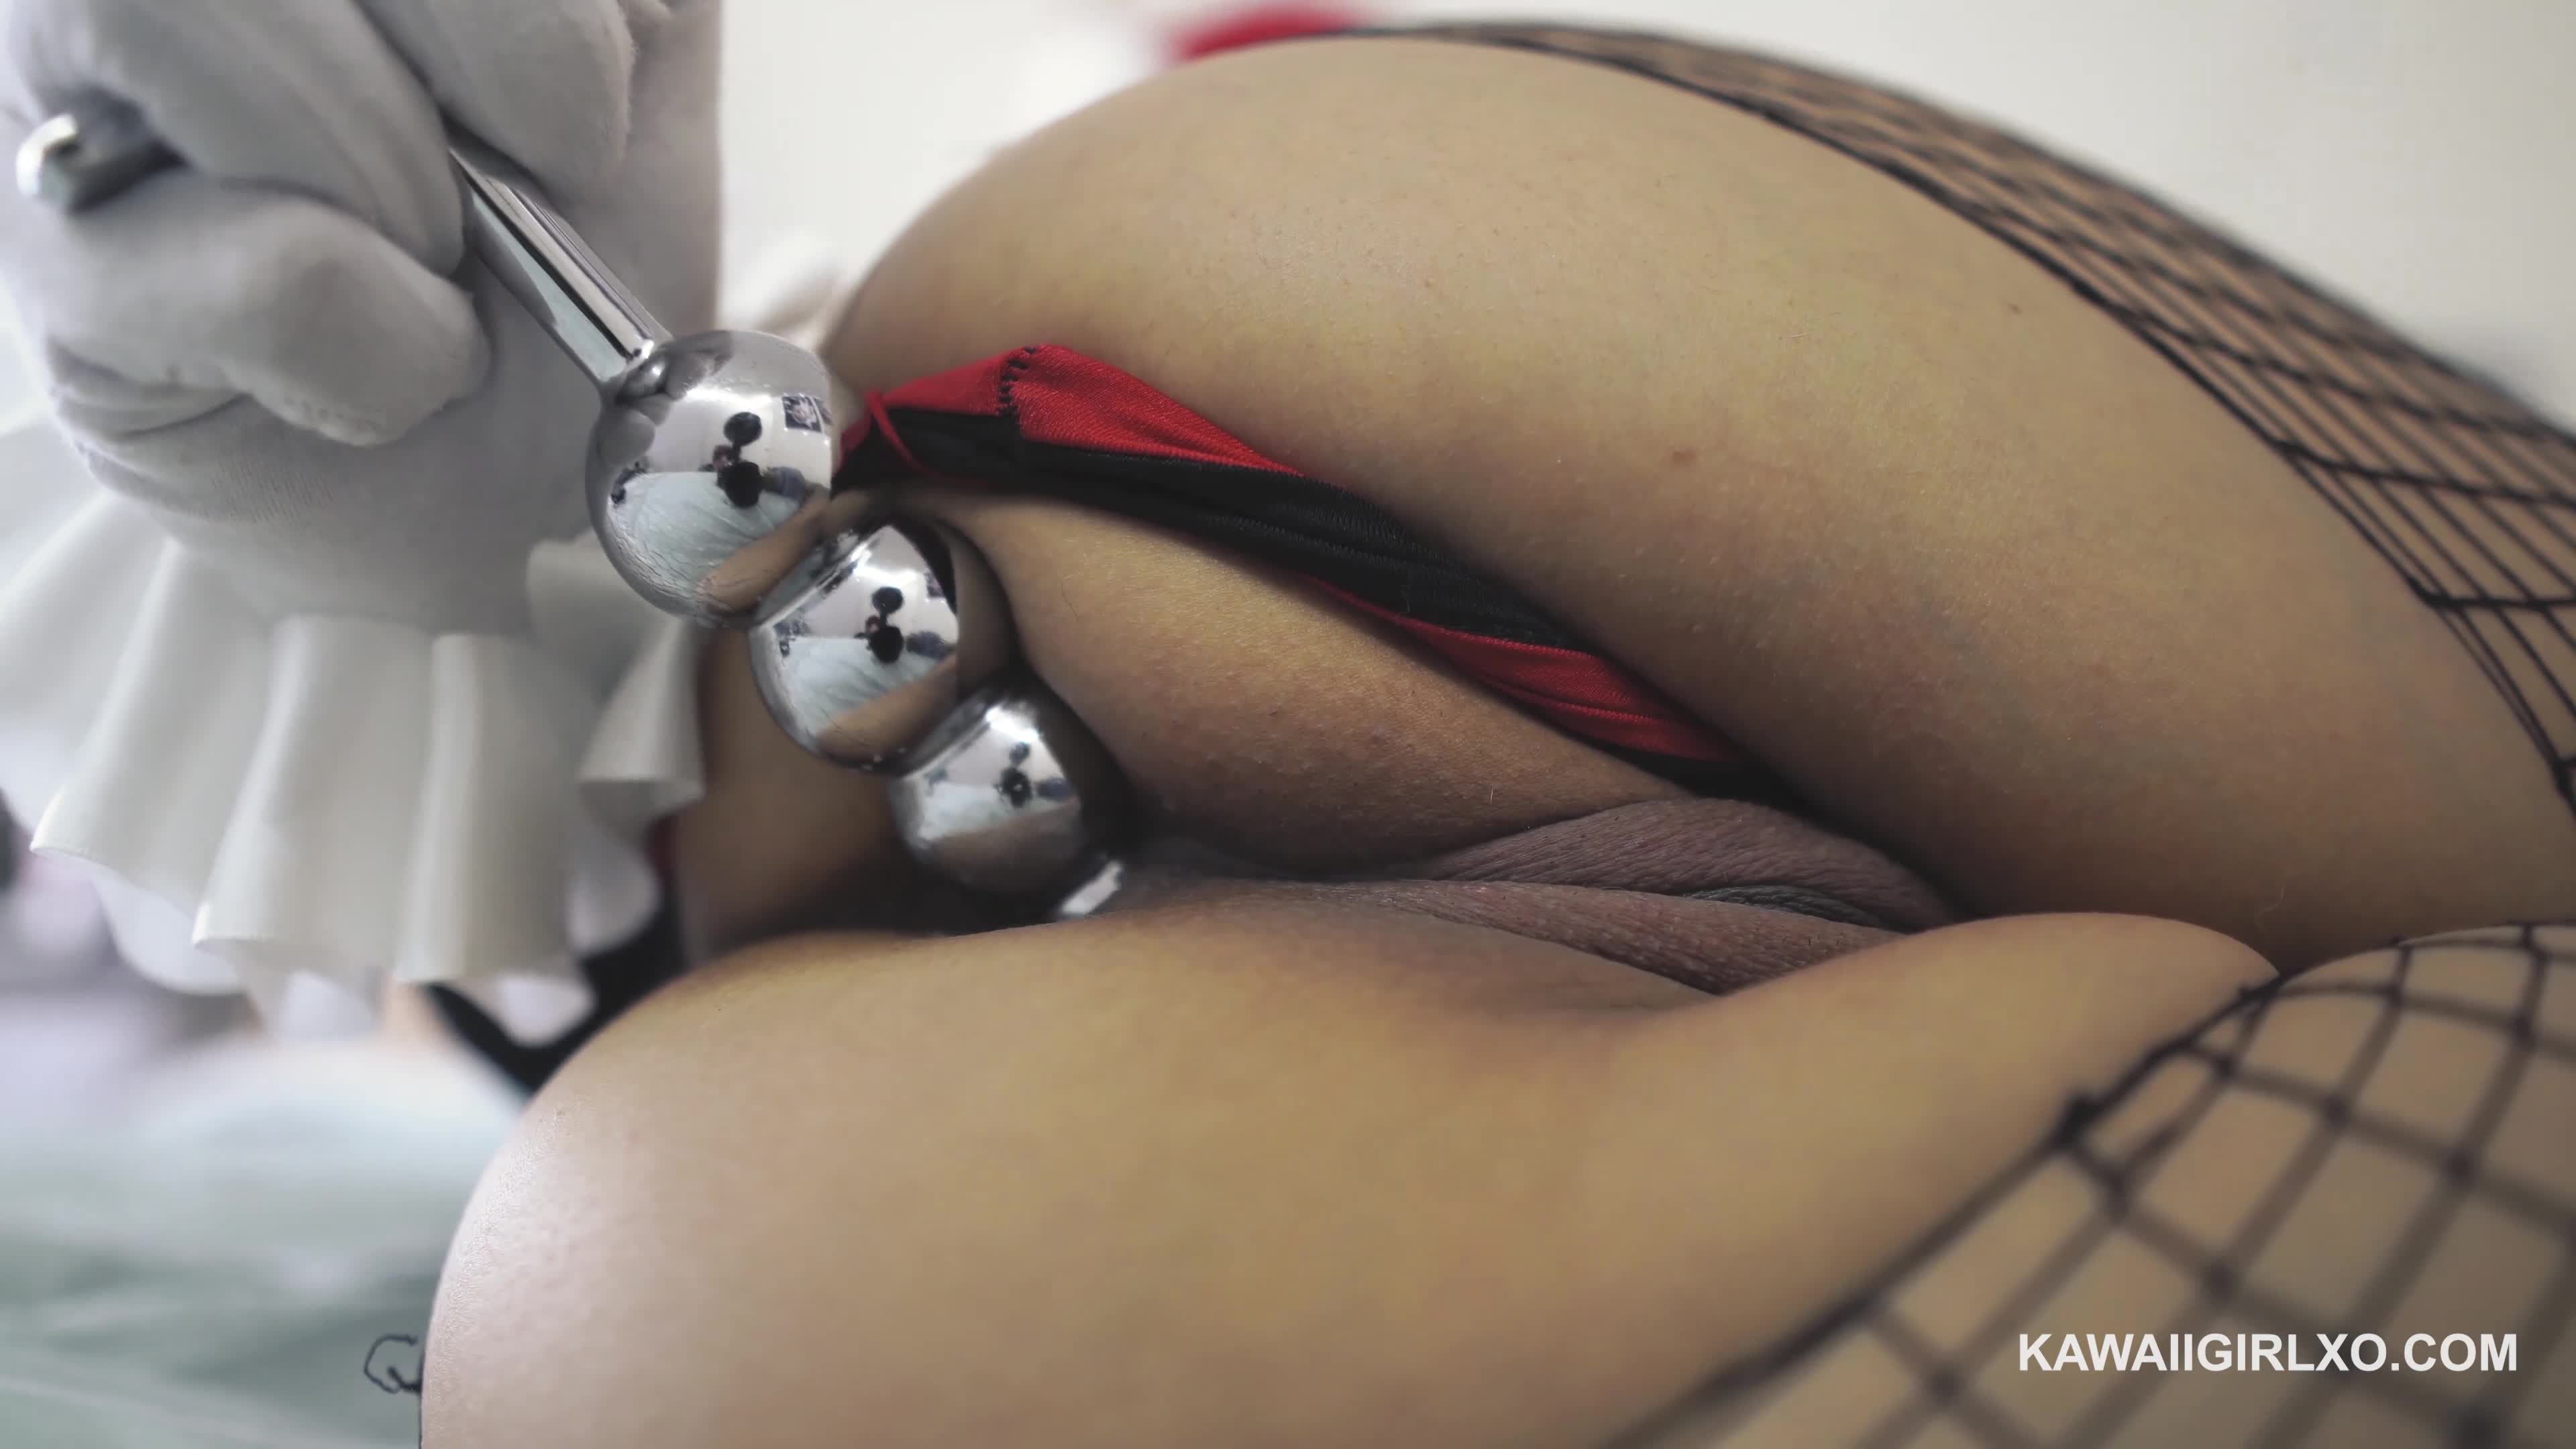 Hot Girl Anal Dildo Ride